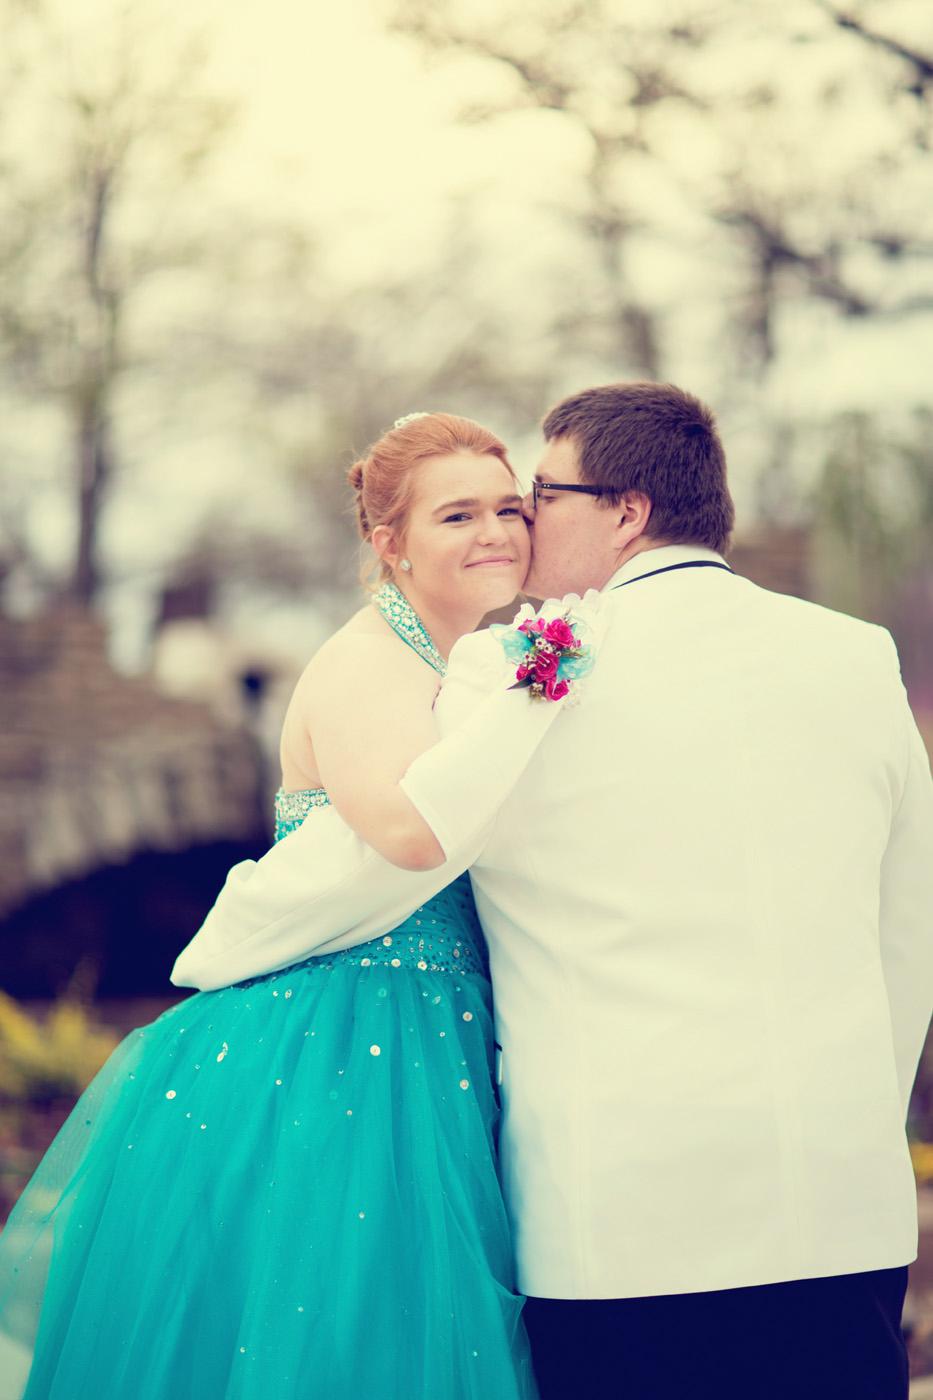 Garrett & Helen Prom 2014 252_1.jpg